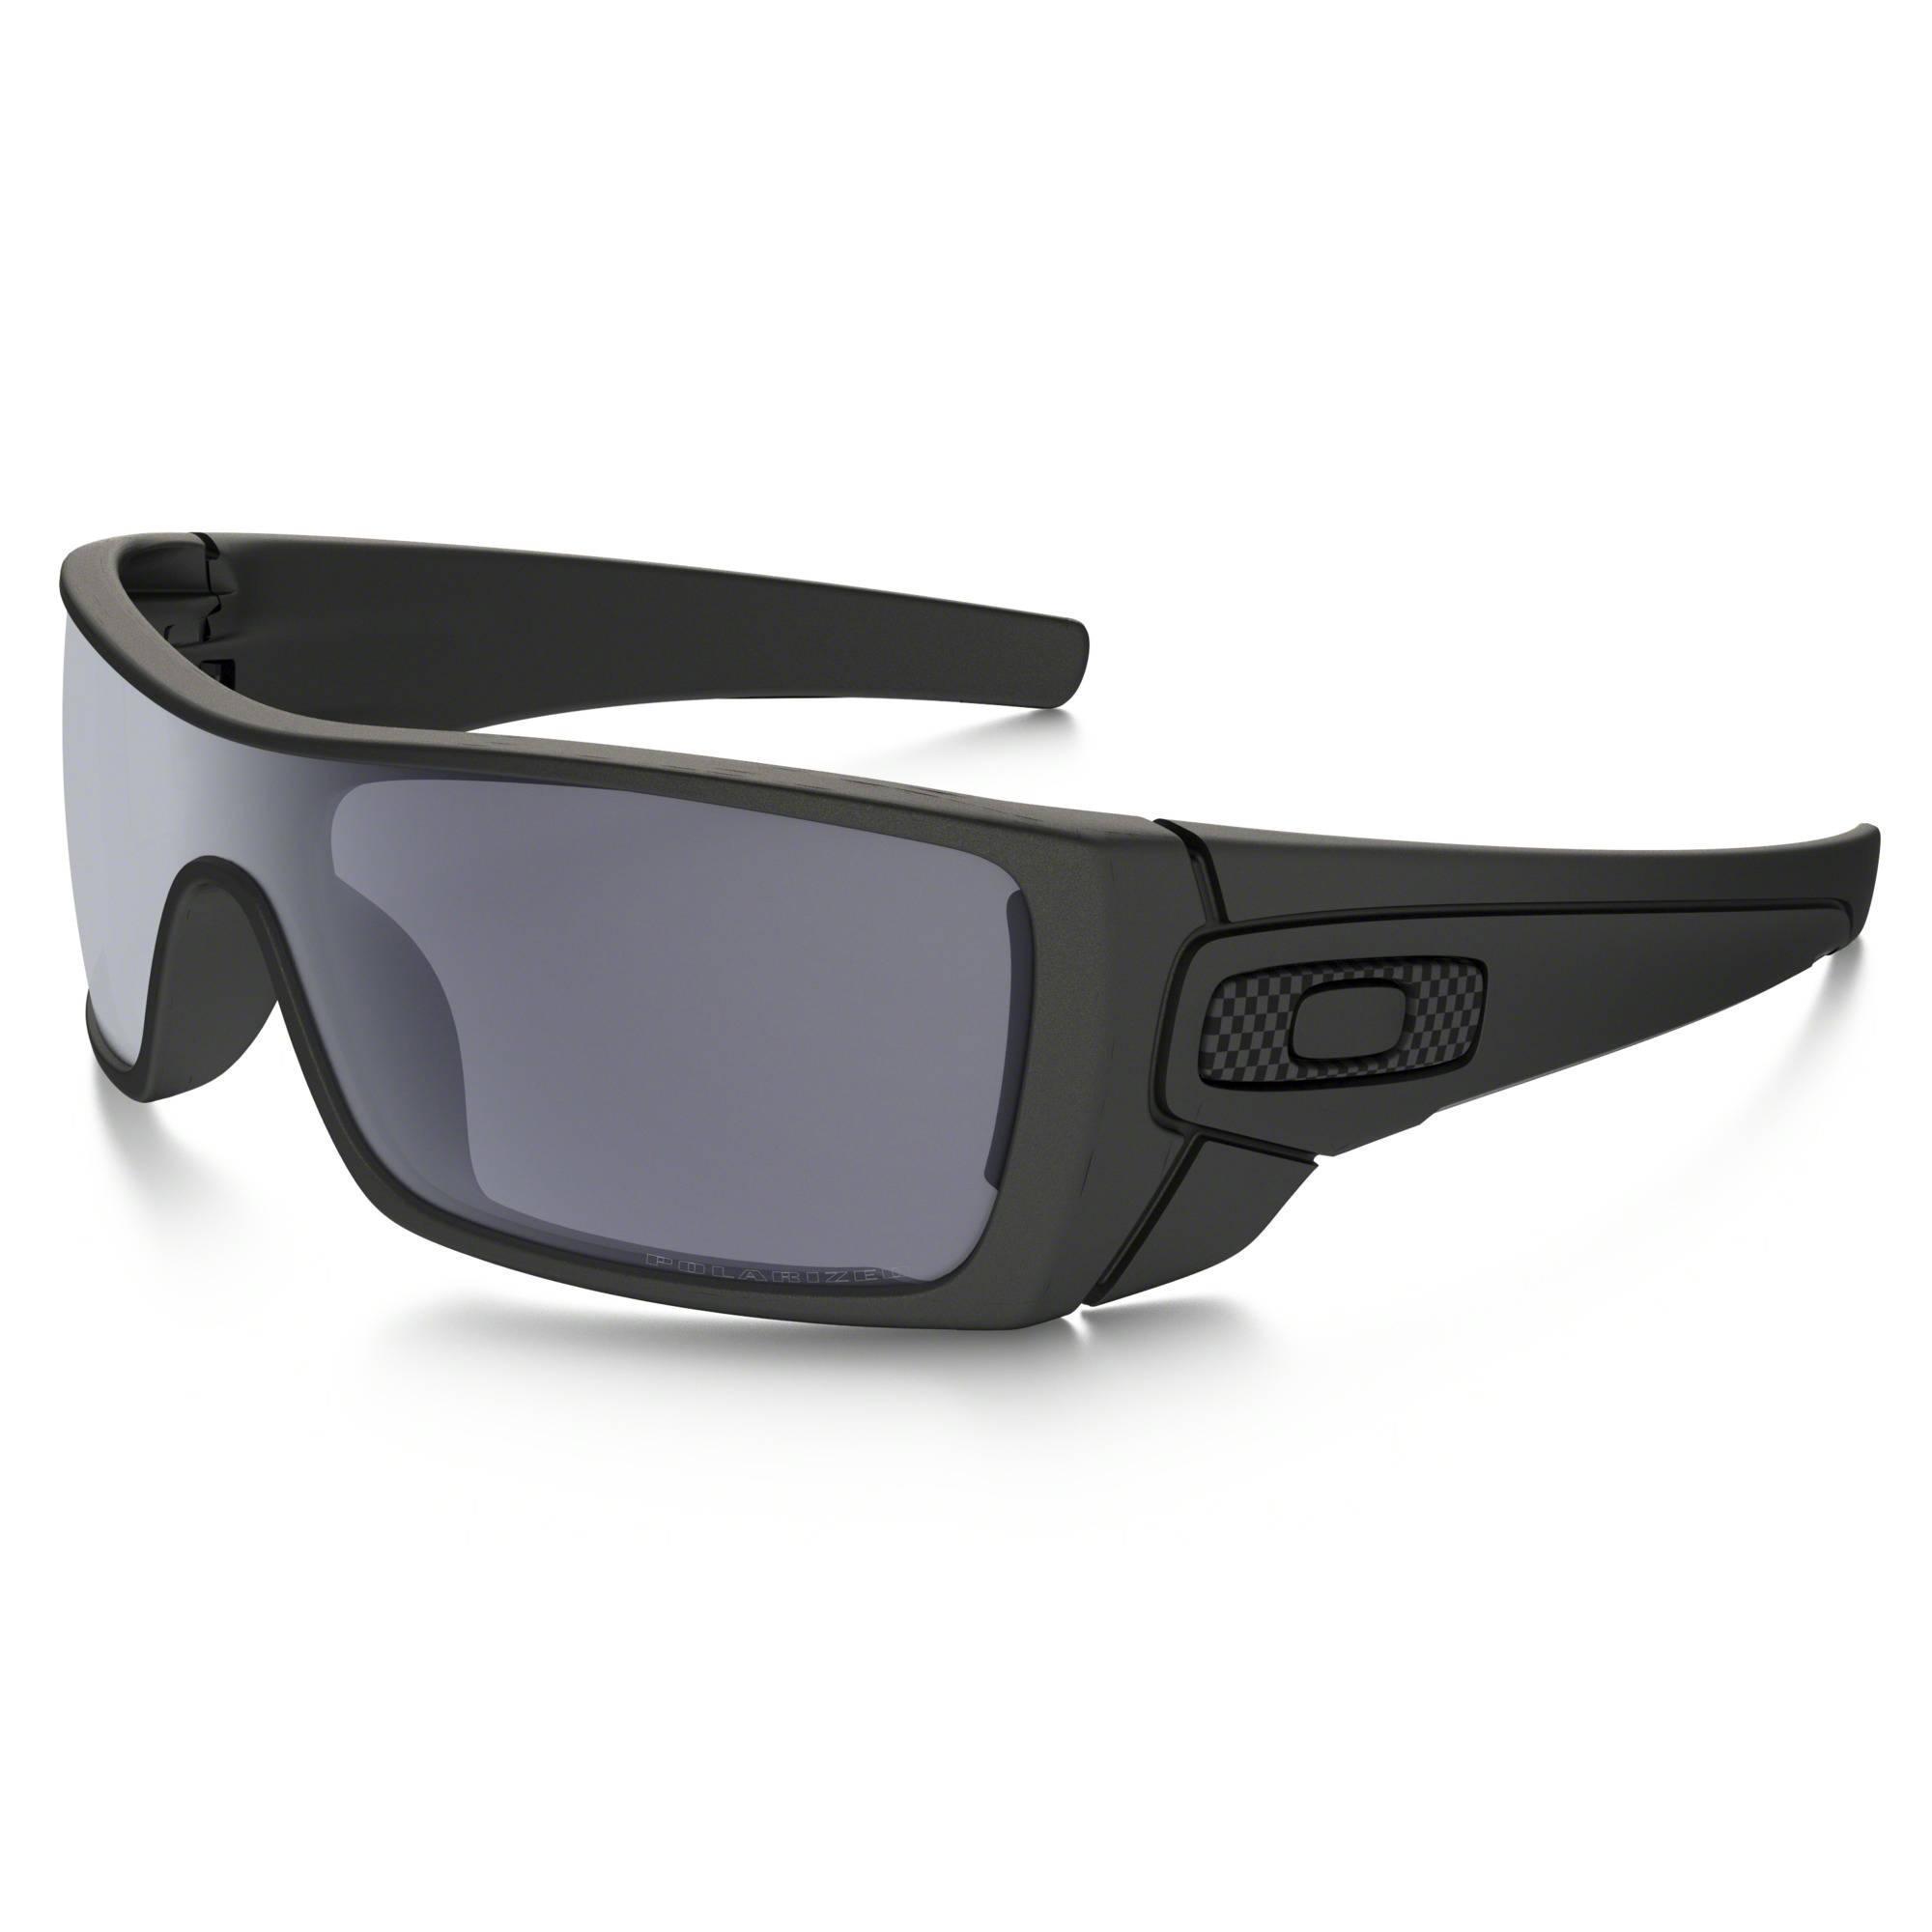 4c776910df Oakley Batwolf Sunglasses 0OO9101-91010427 B H Photo Video